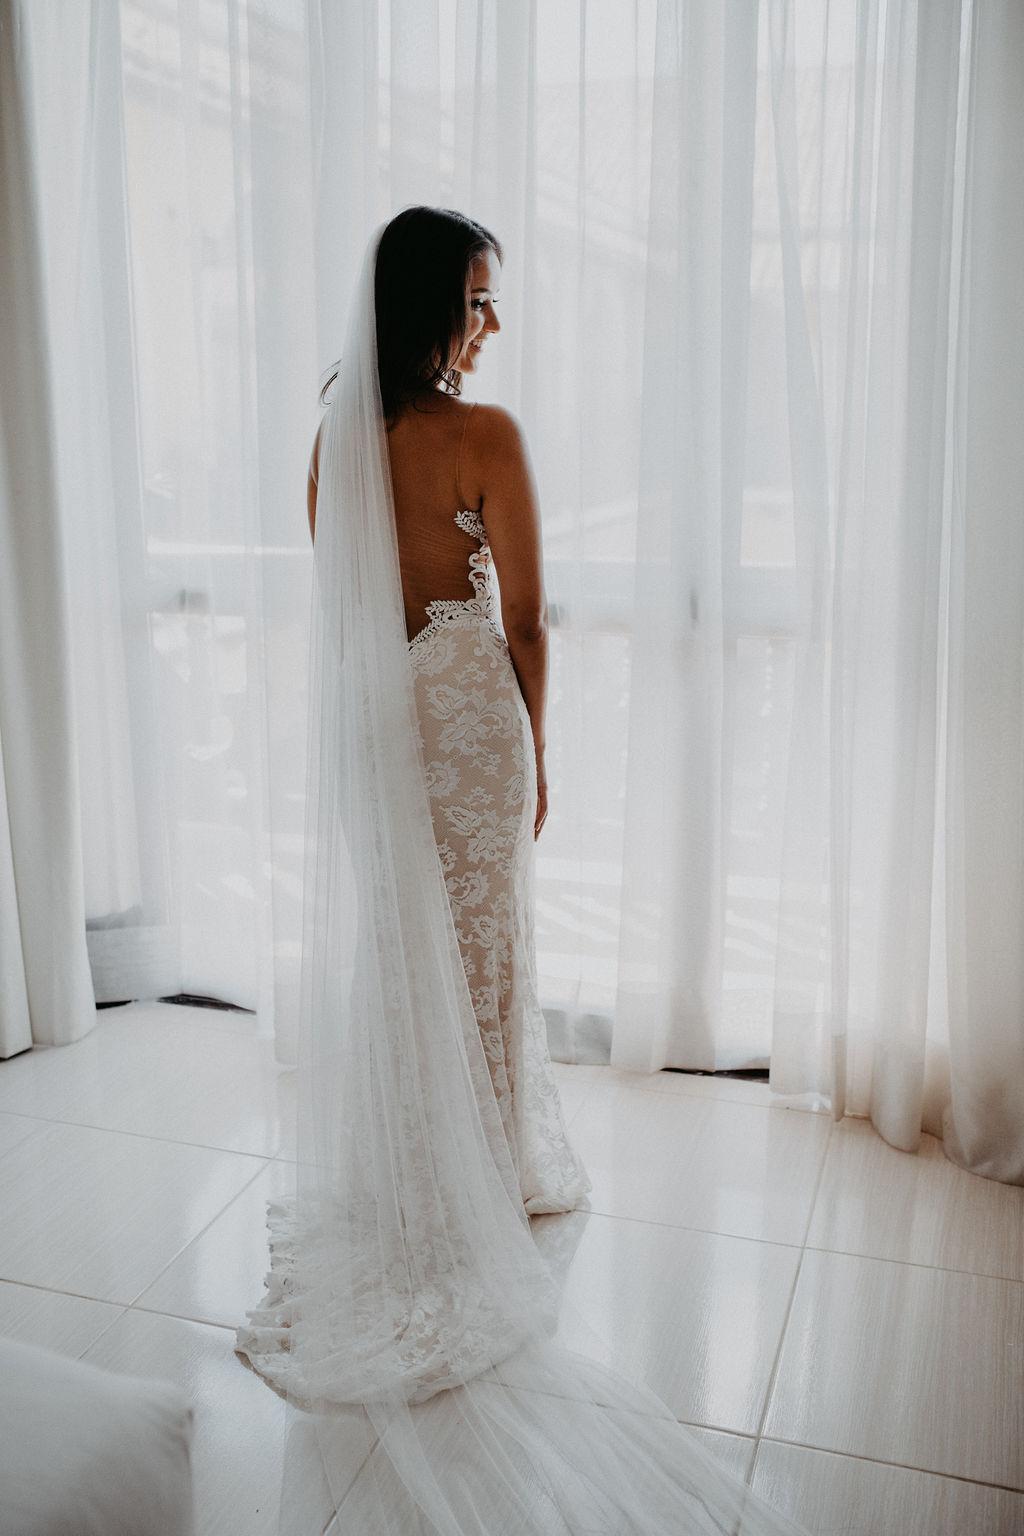 julieth-bravo-wedding-planner-bride-destination-wedding-bride-novia-colombia-dress-weddingdress.jpg